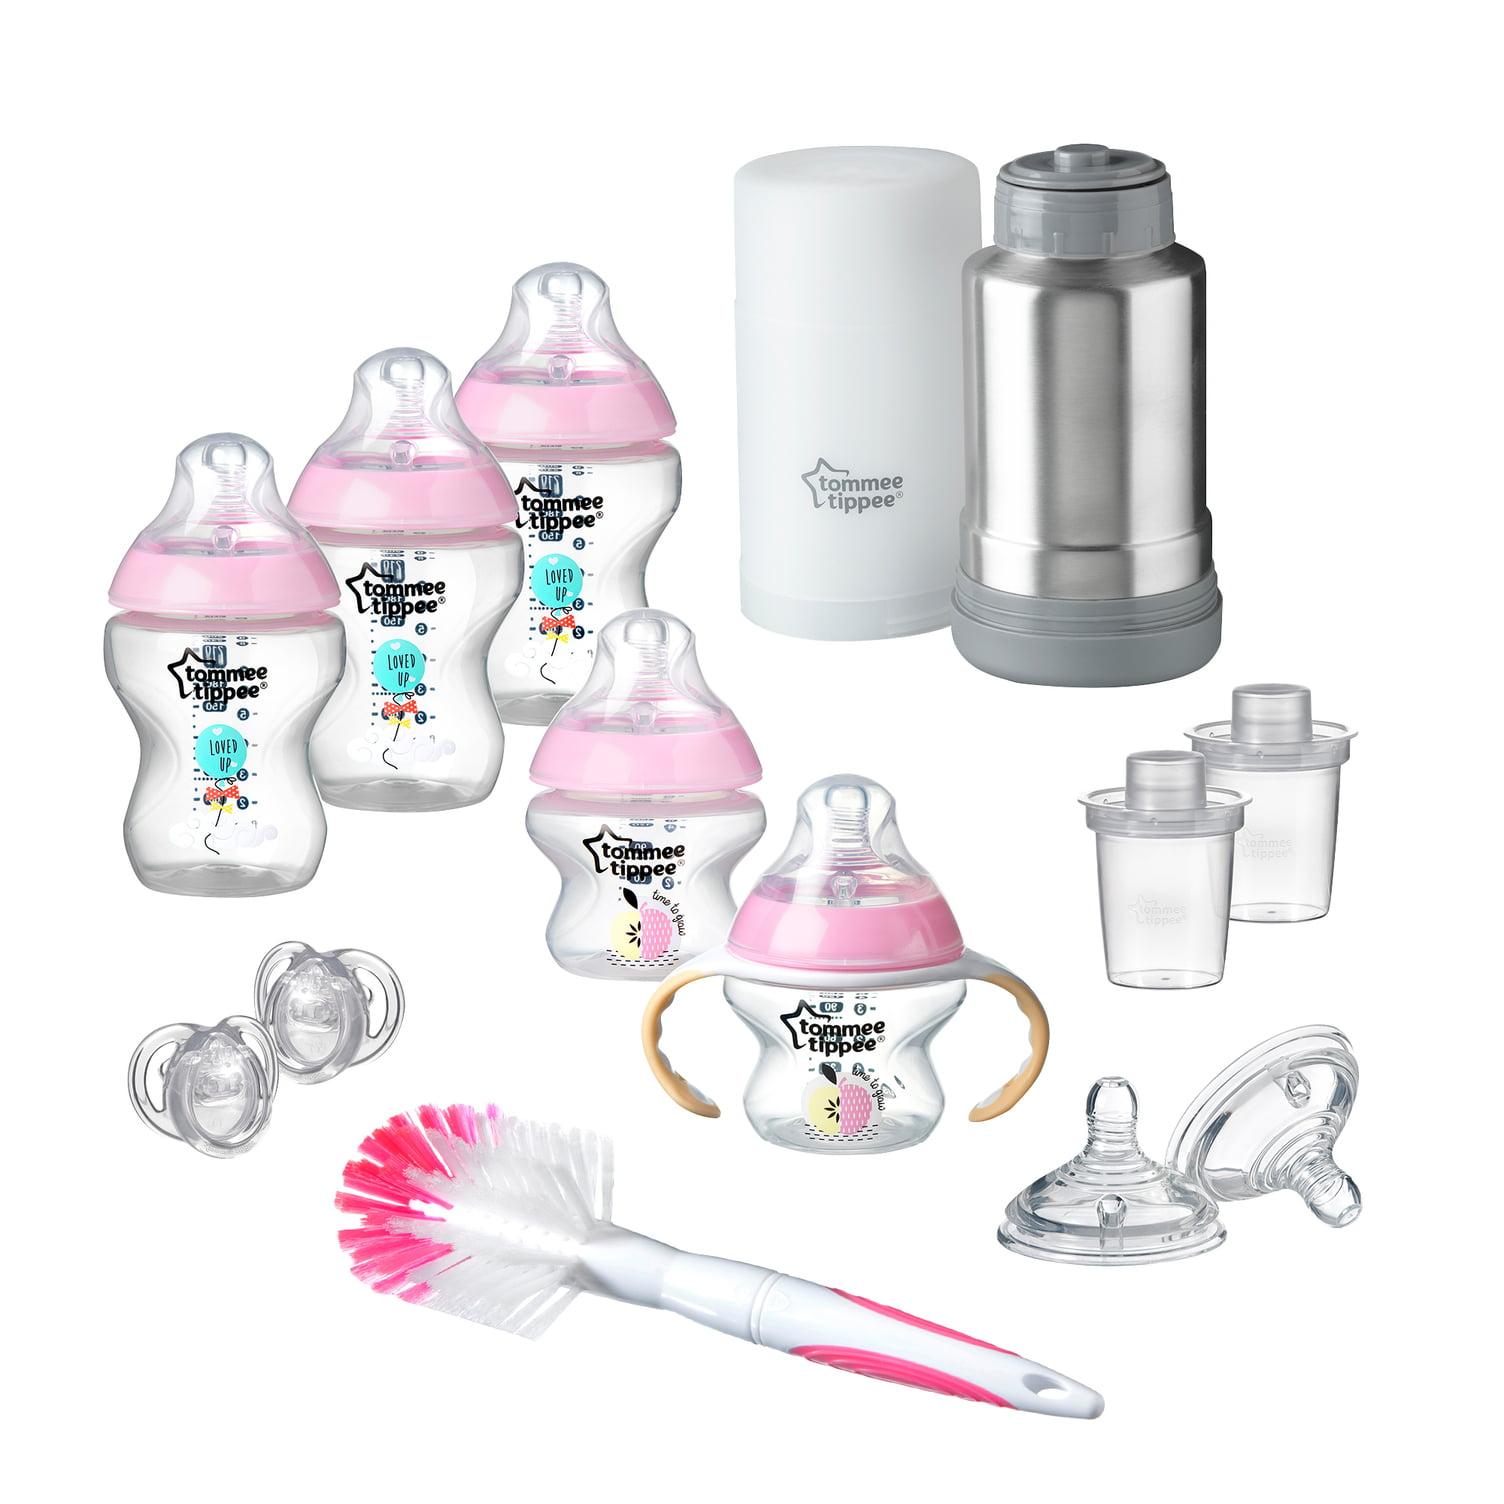 Tommee Tippee Closer to Nature, Newborn Baby Bottle Feeding Starter Set, Pink, Girl